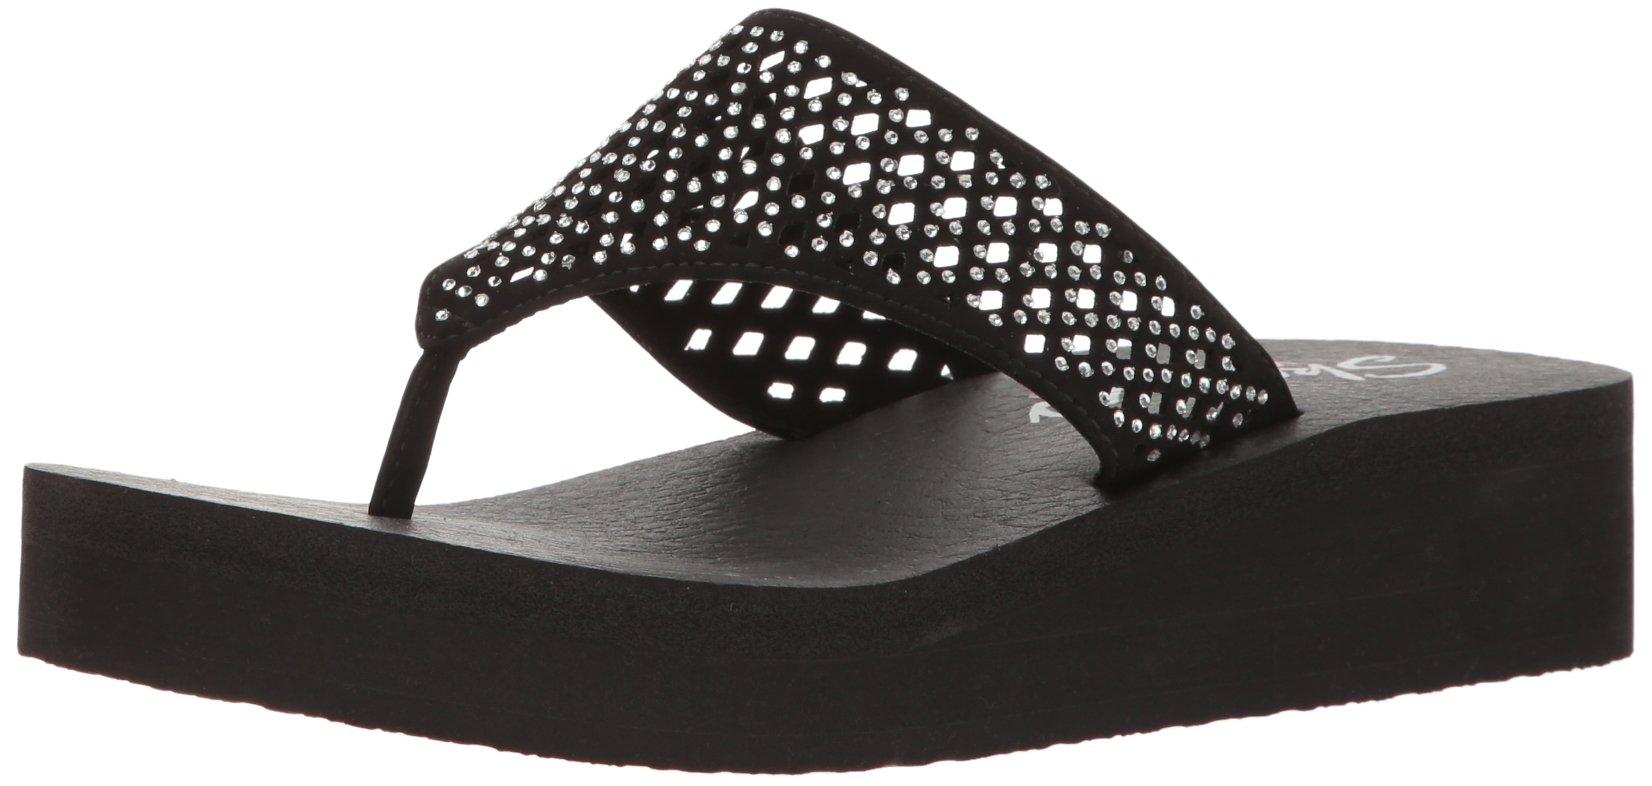 Skechers Cali Women's Vinyasa Flow Wedge Sandal, Black Cutout, 6 B(M) US by Skechers (Image #1)